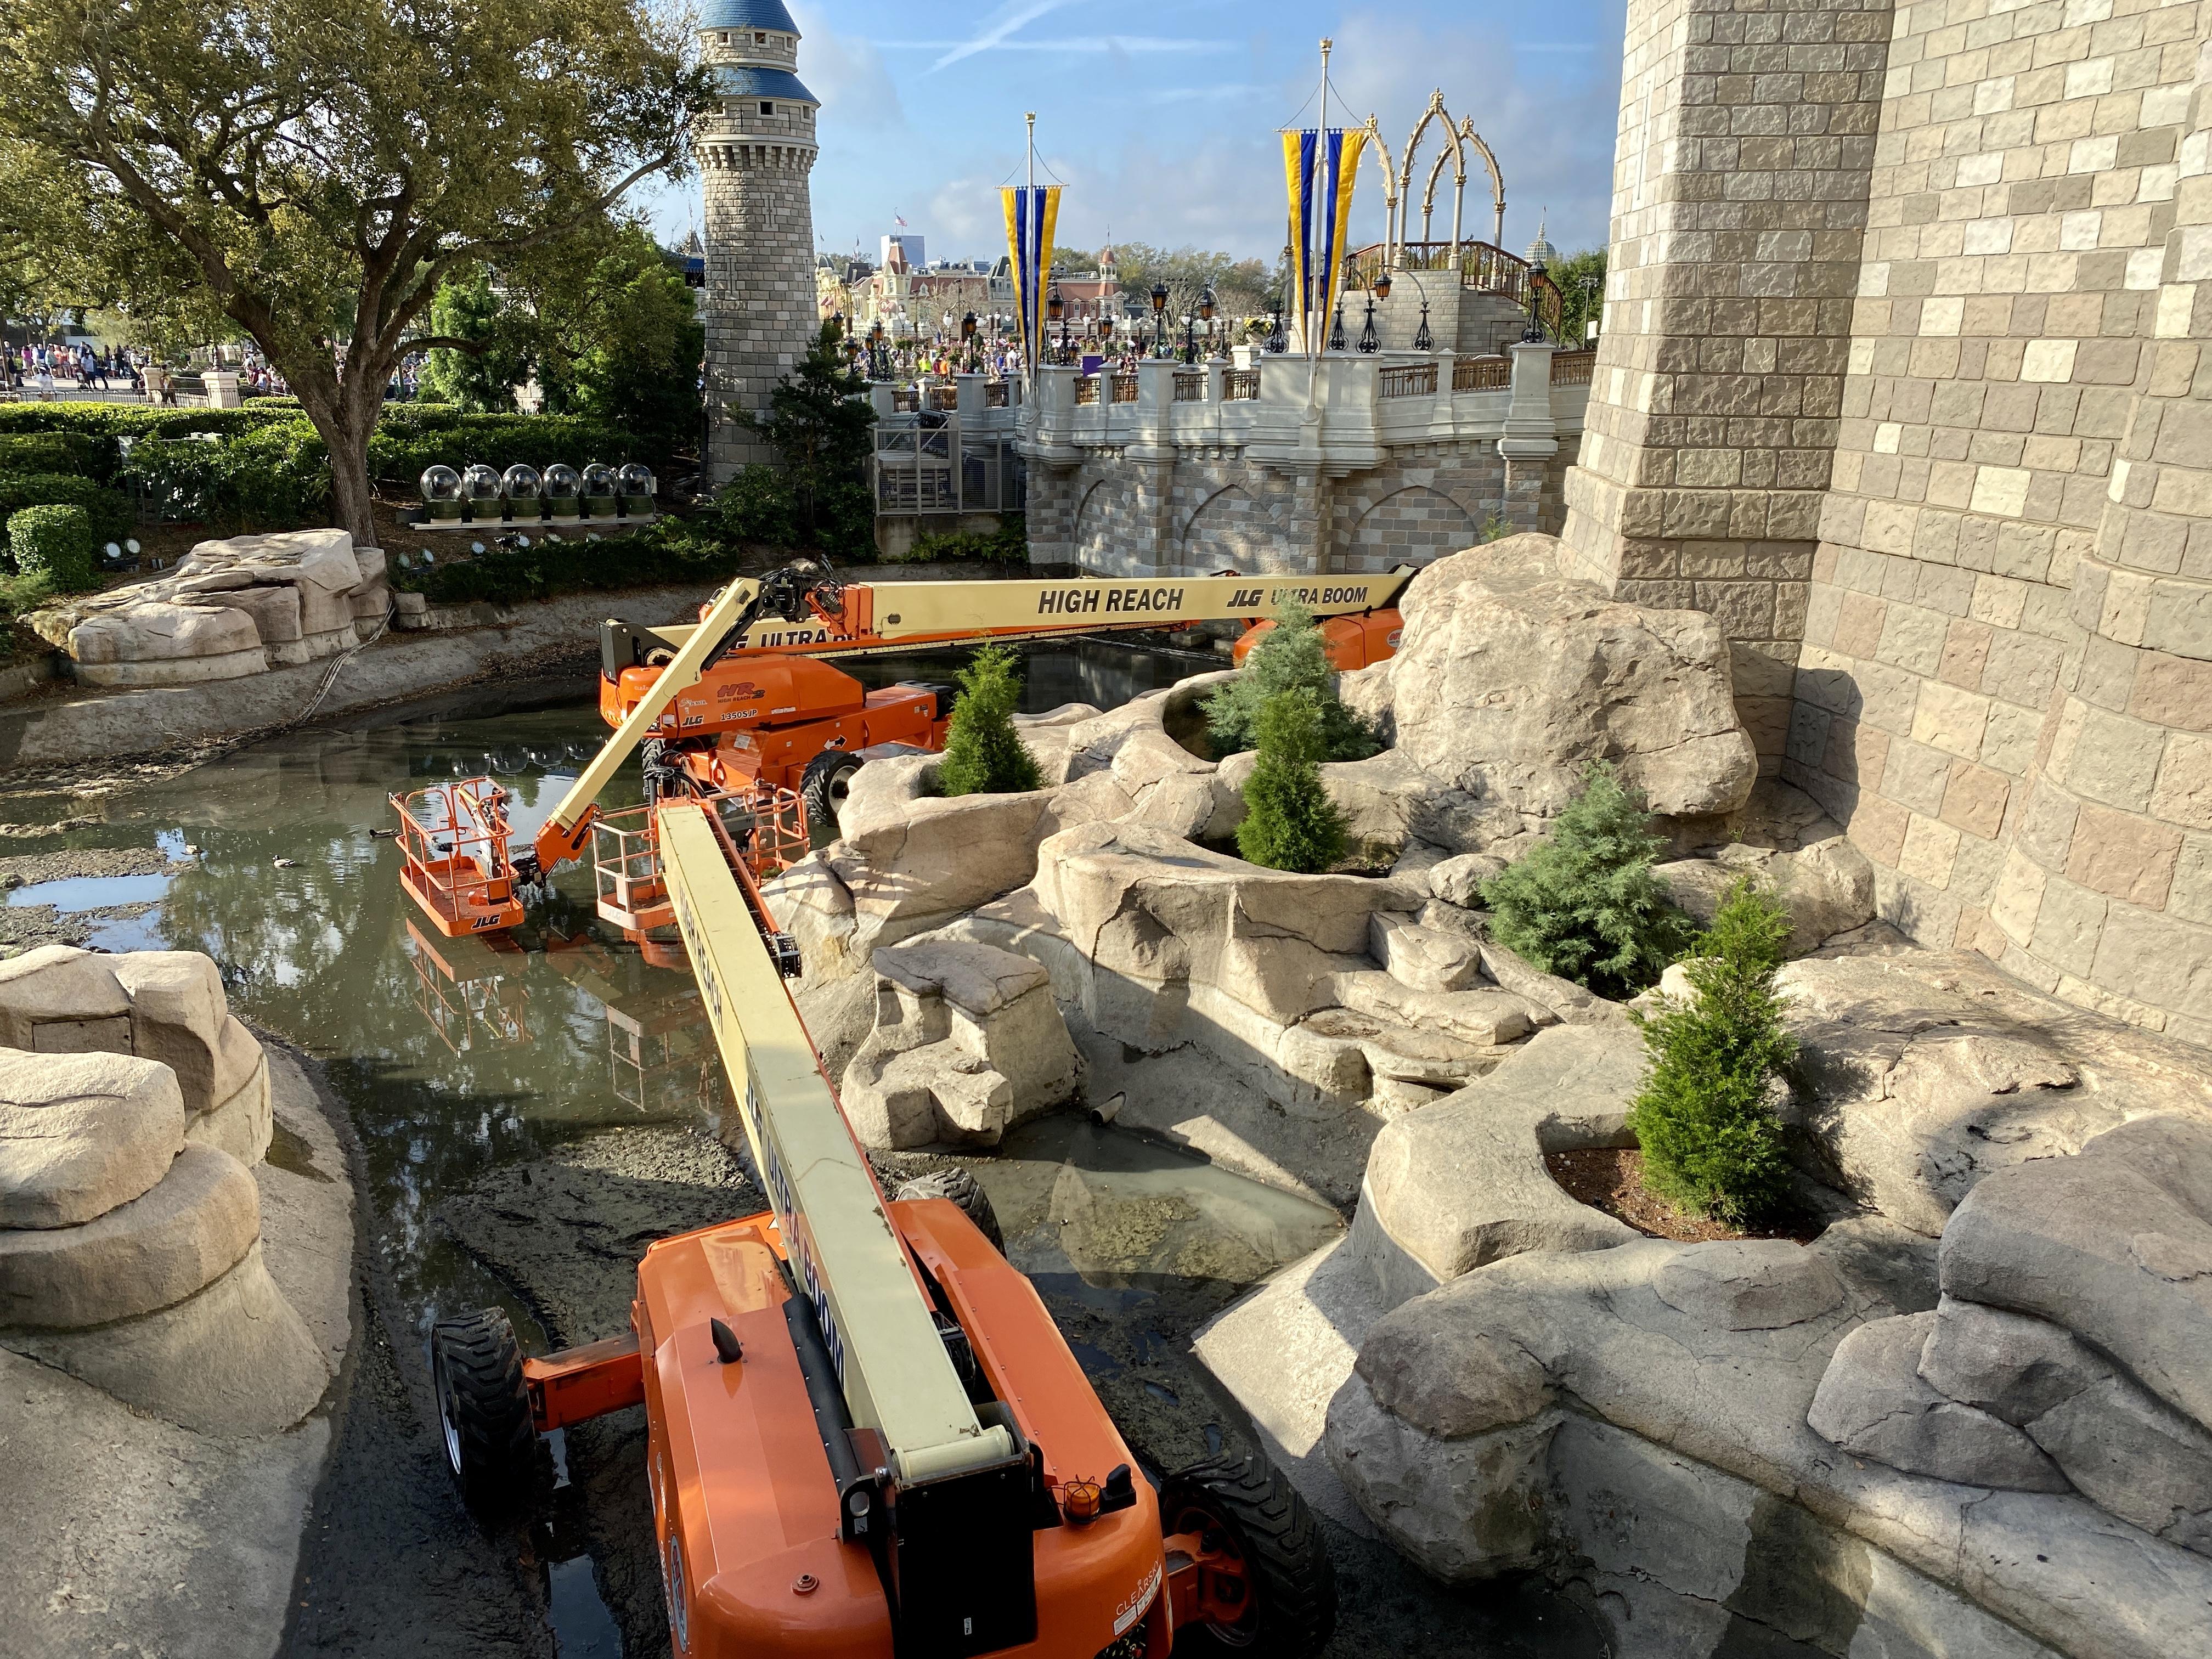 Cinderella caste moat machinery